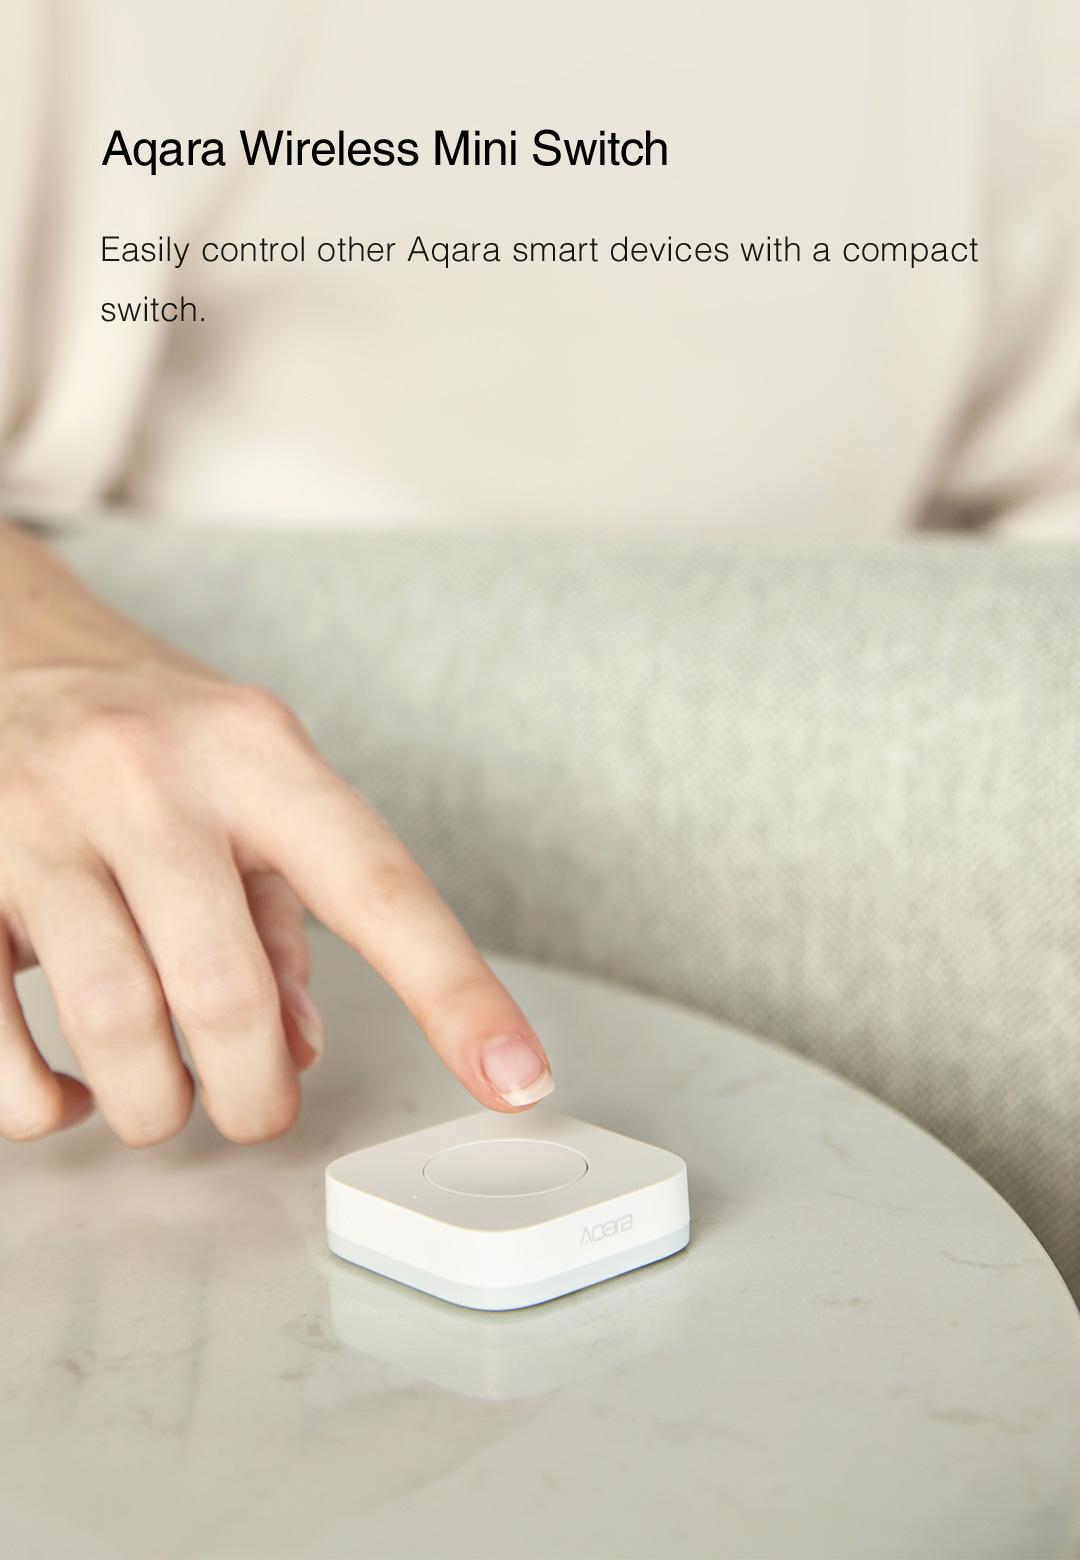 Aqara smart wireless light switch - homekit remote switch for Aqara smart devices